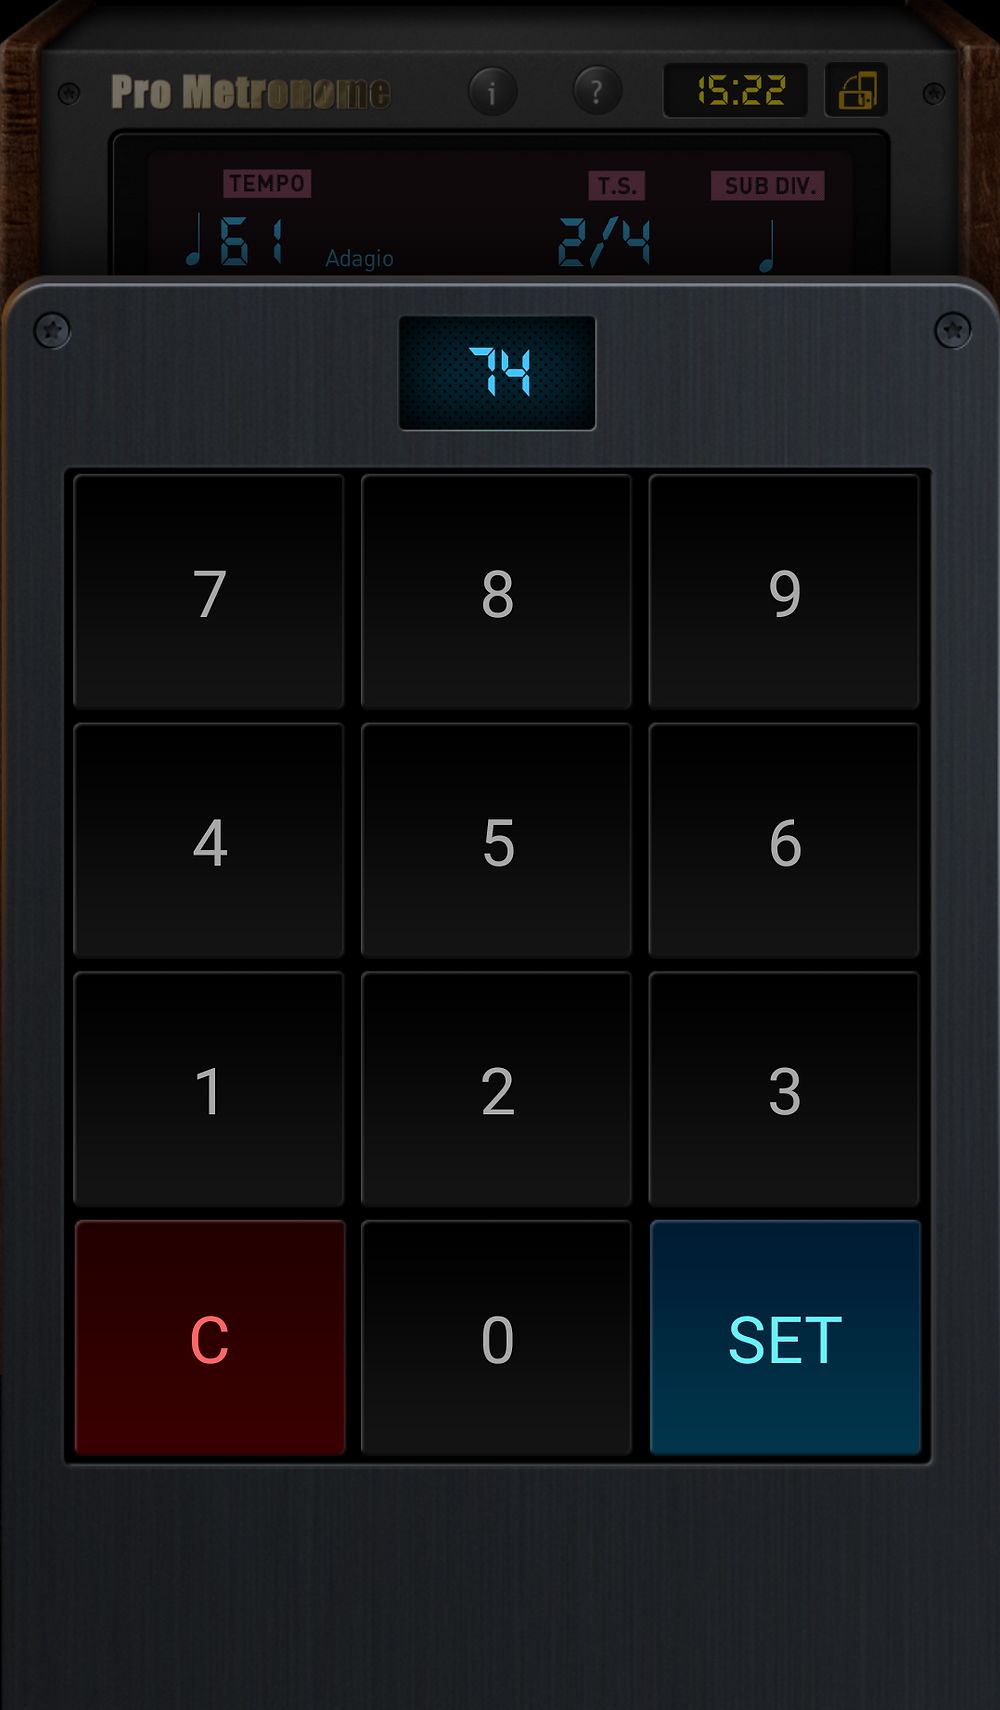 Pro Metronome choose your tempo